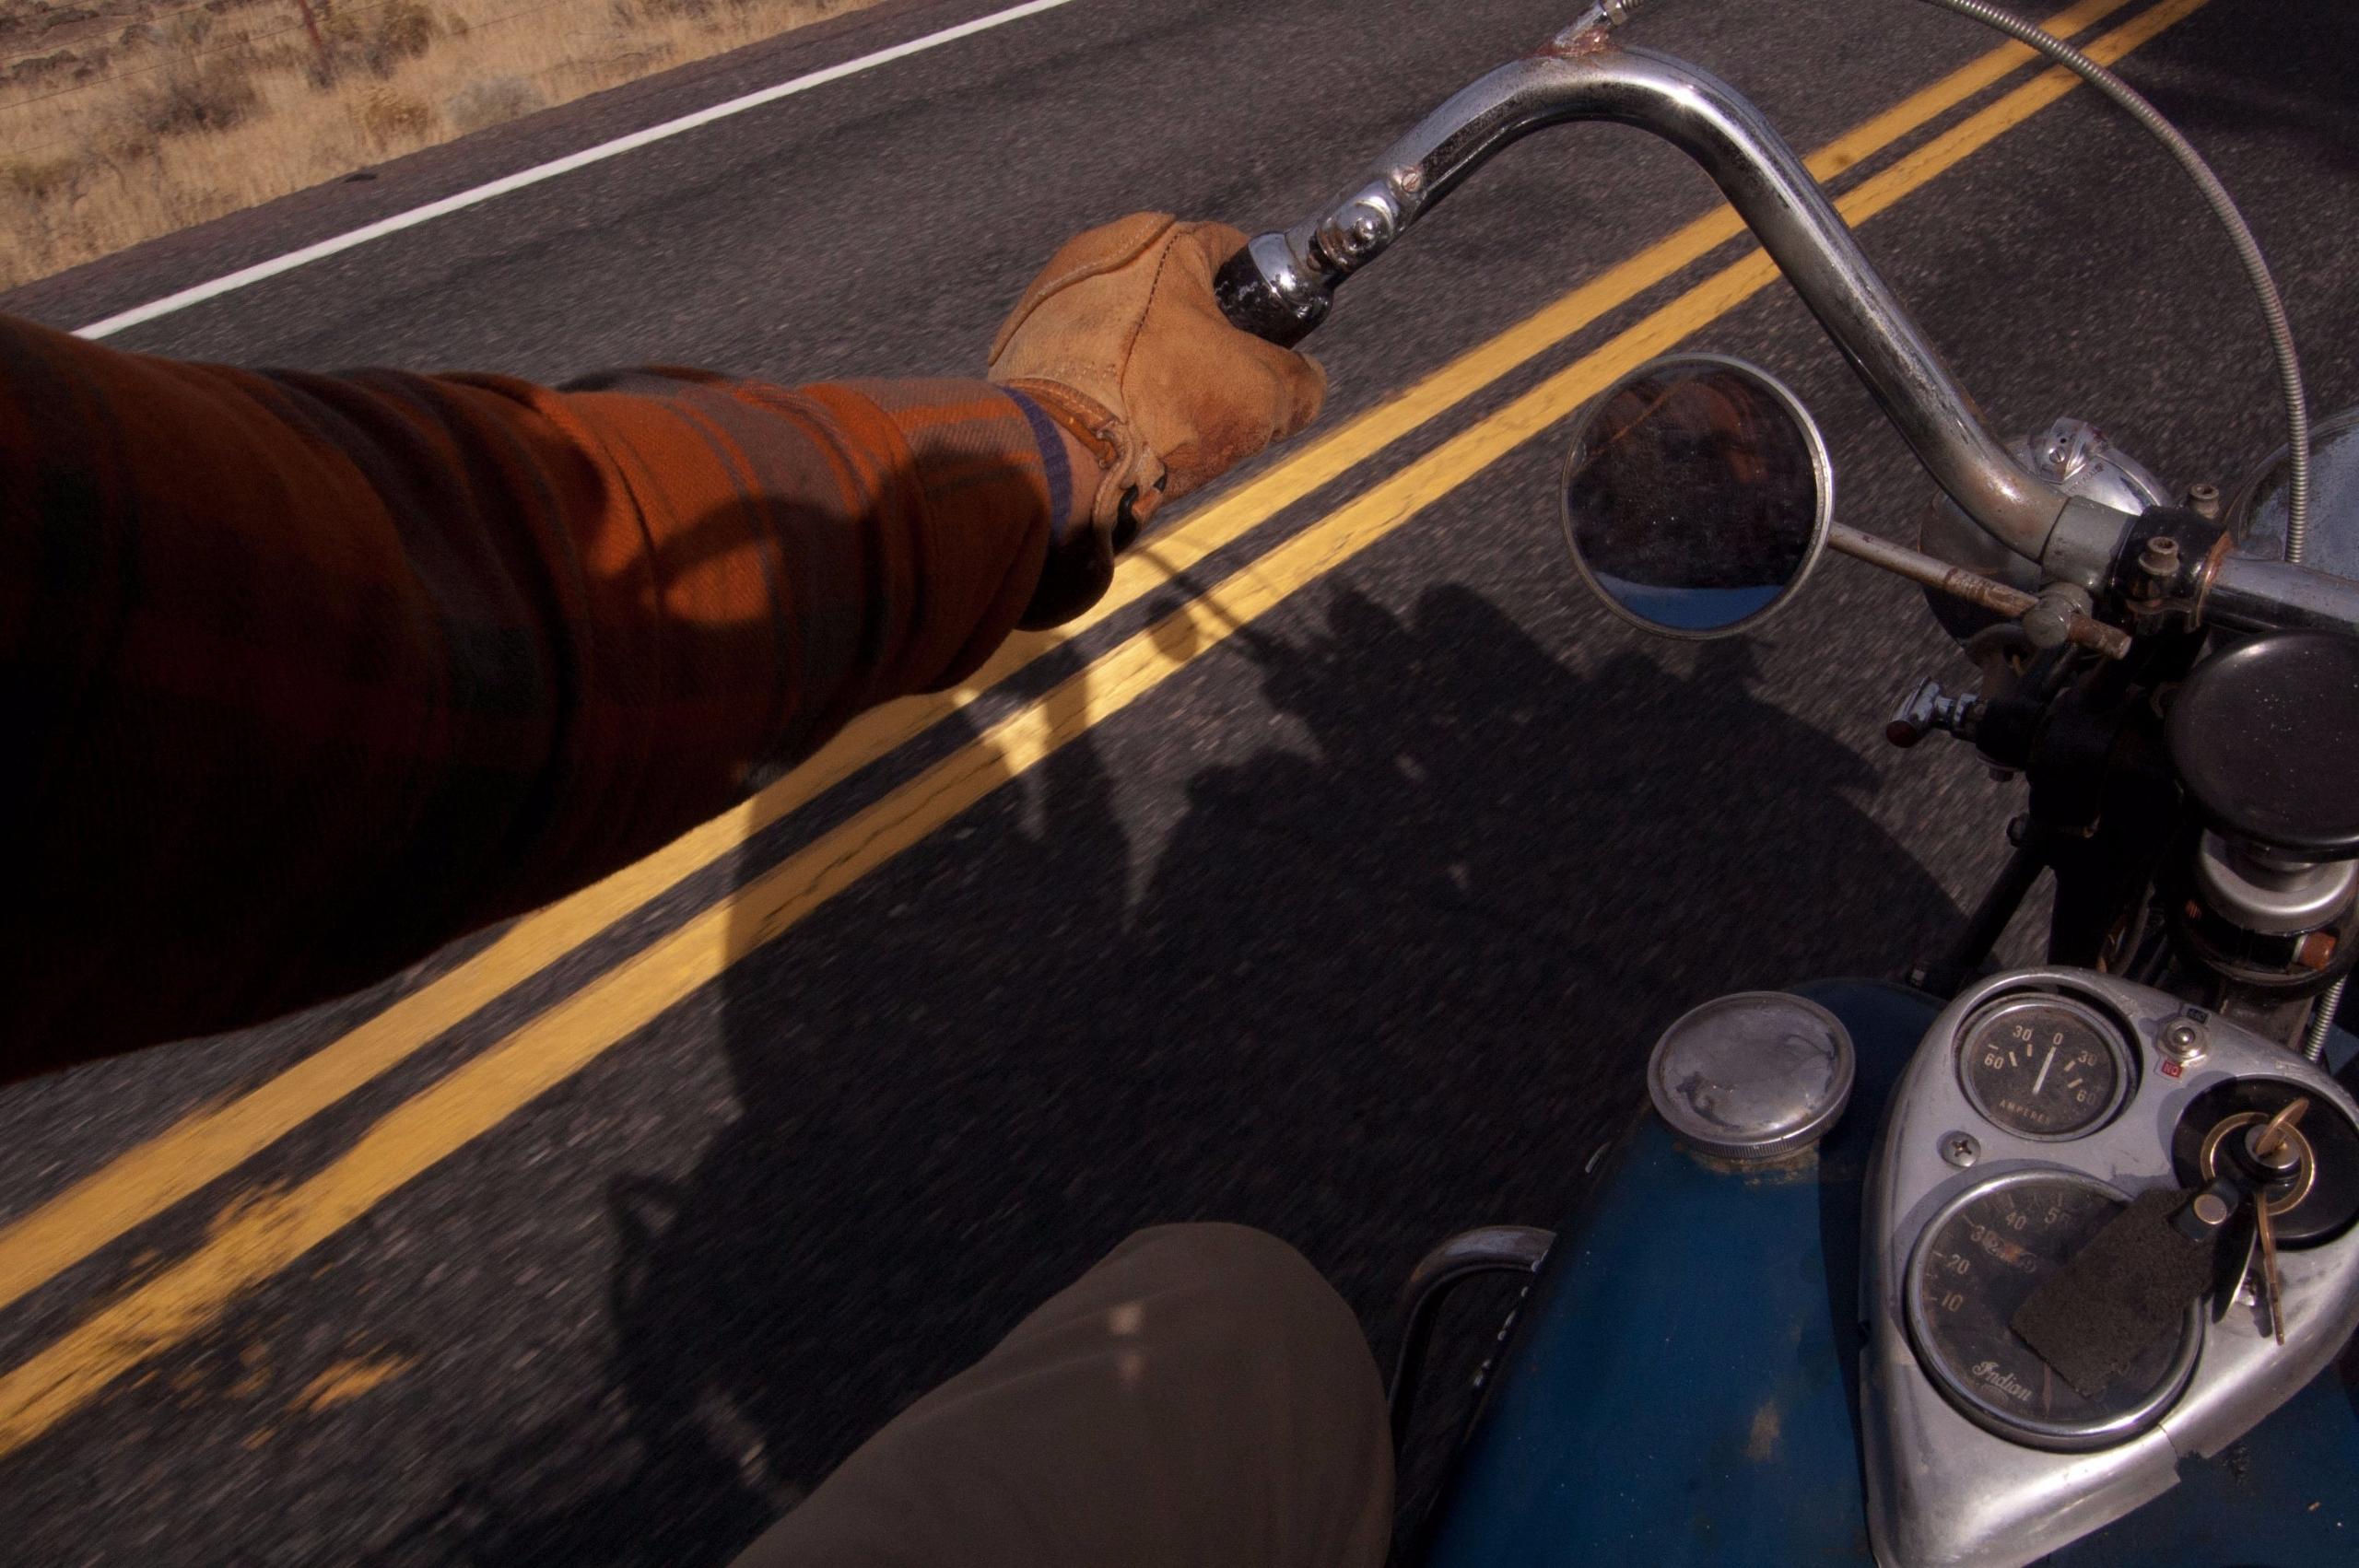 Roadside Visuals Americana Paci - join_revel | ello